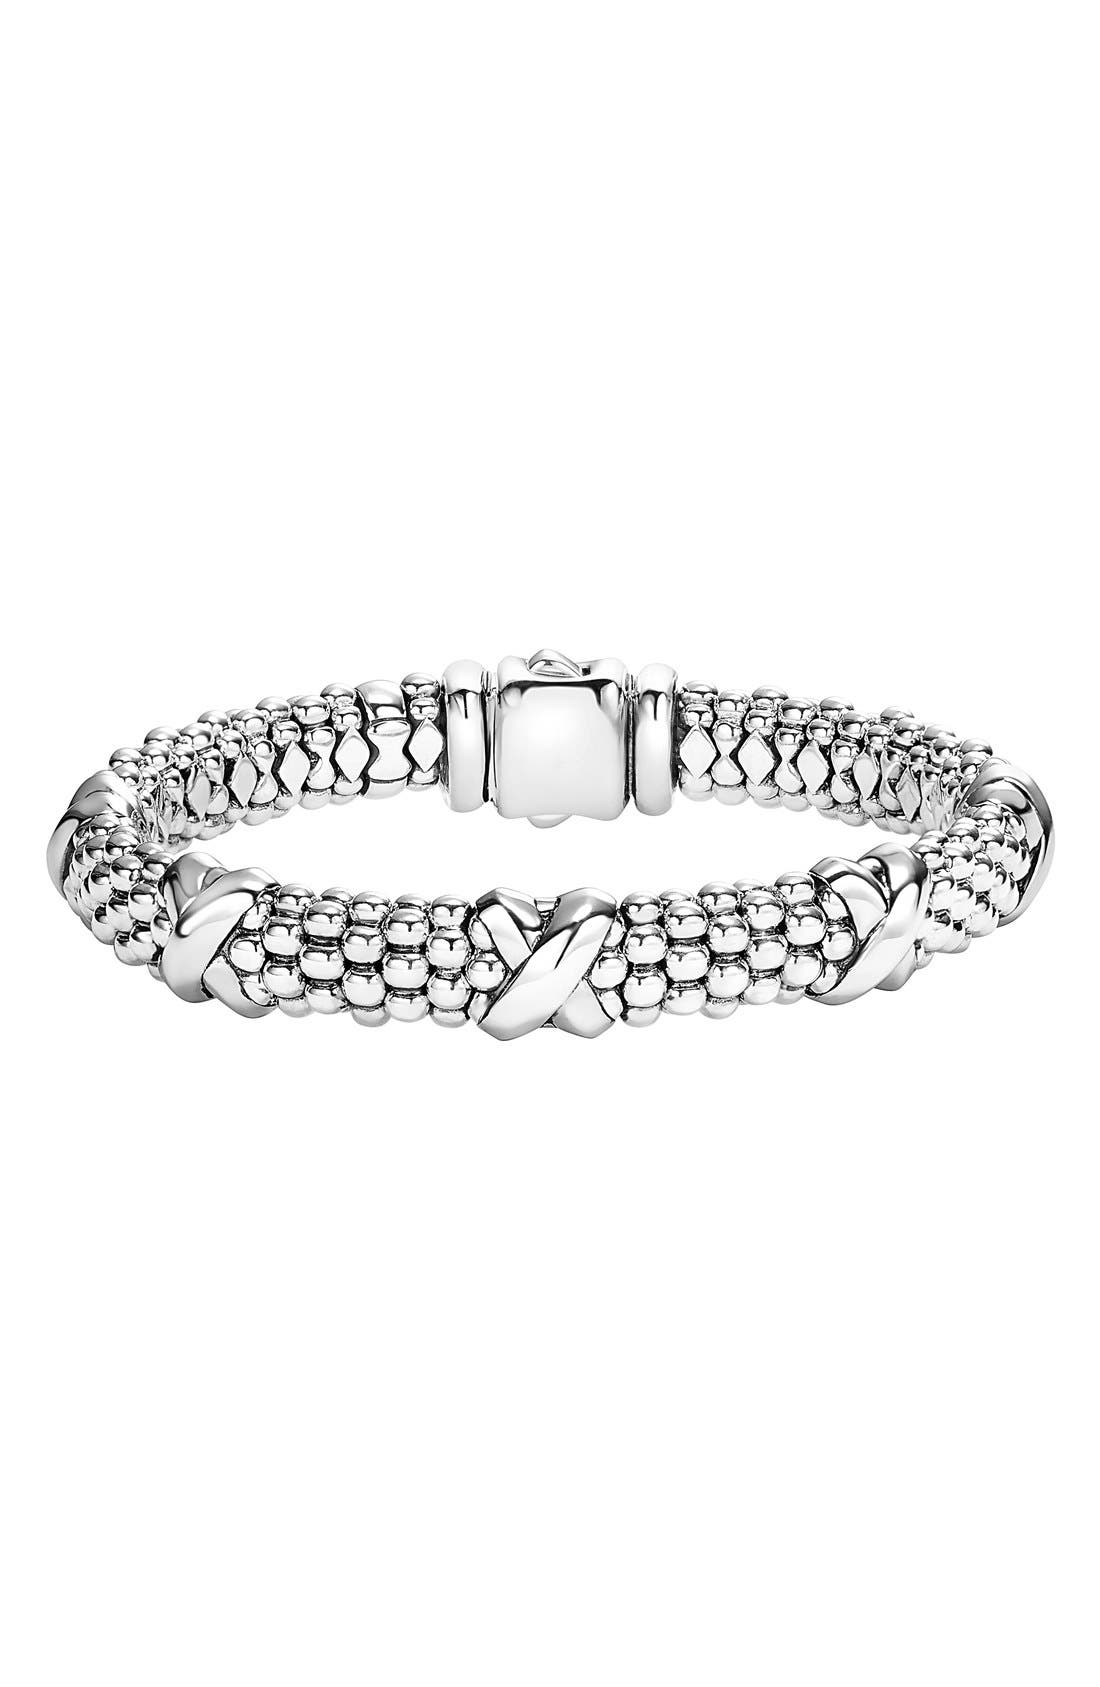 LAGOS 'Signature Caviar' Oval Rope Bracelet